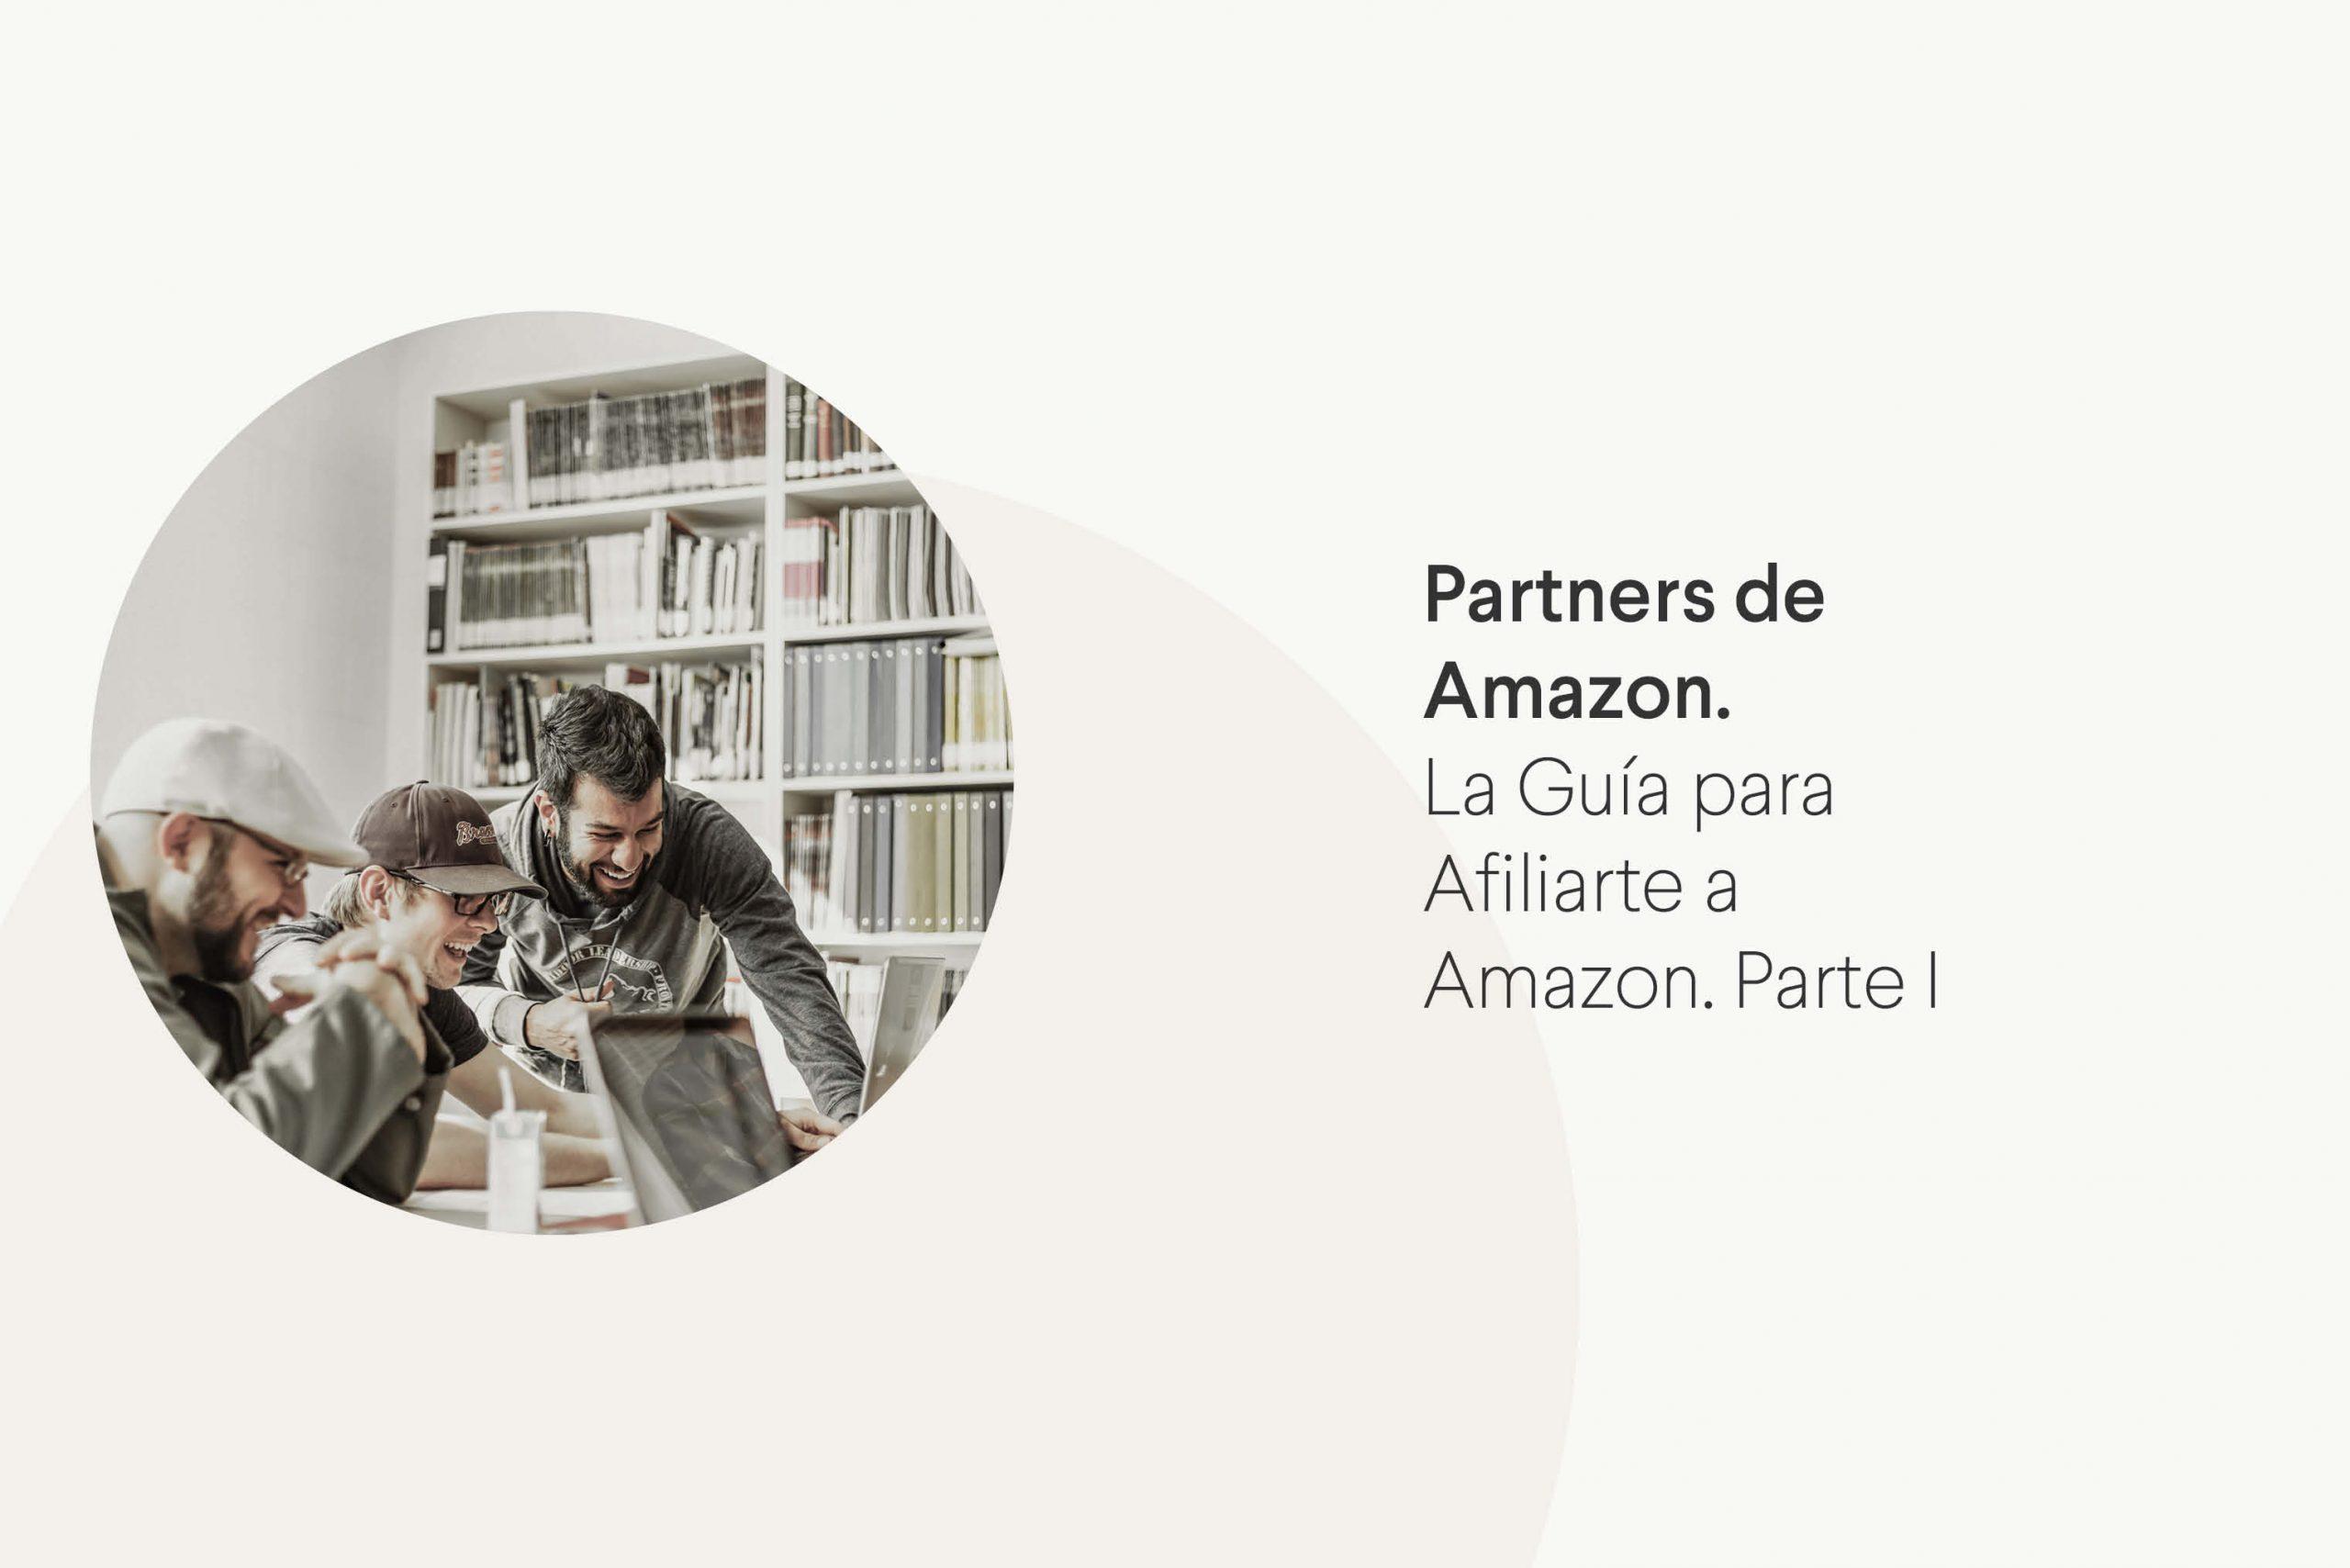 Partners de Amazon